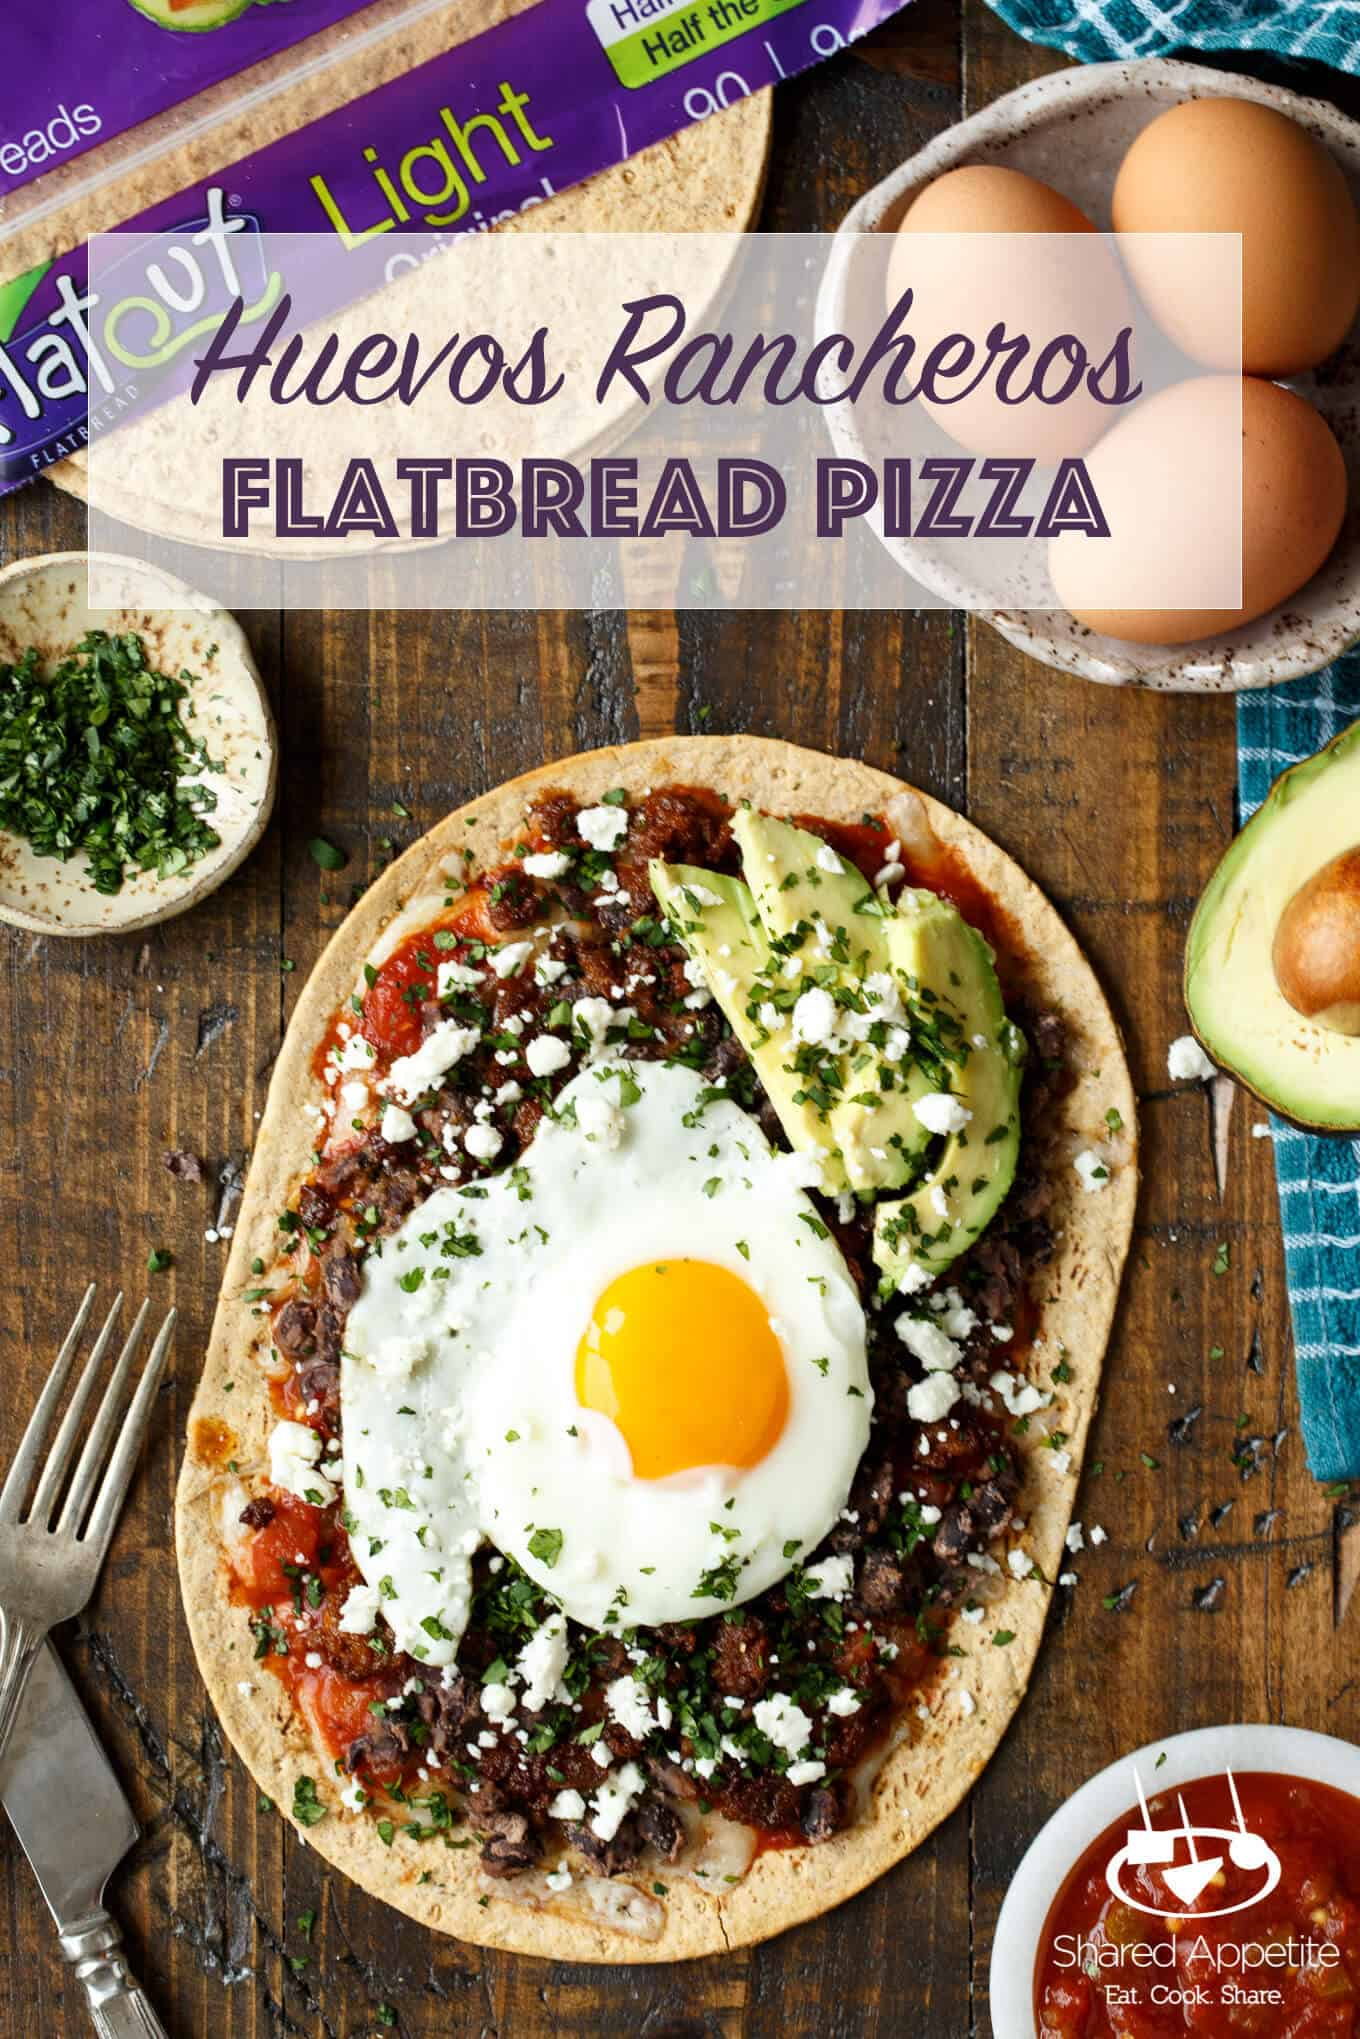 Huevos Rancheros Flatbread Pizza with Monterey Jack Cheese, Salsa, Black Beans, Avocado, and a Fried Egg! sharedappetite.com